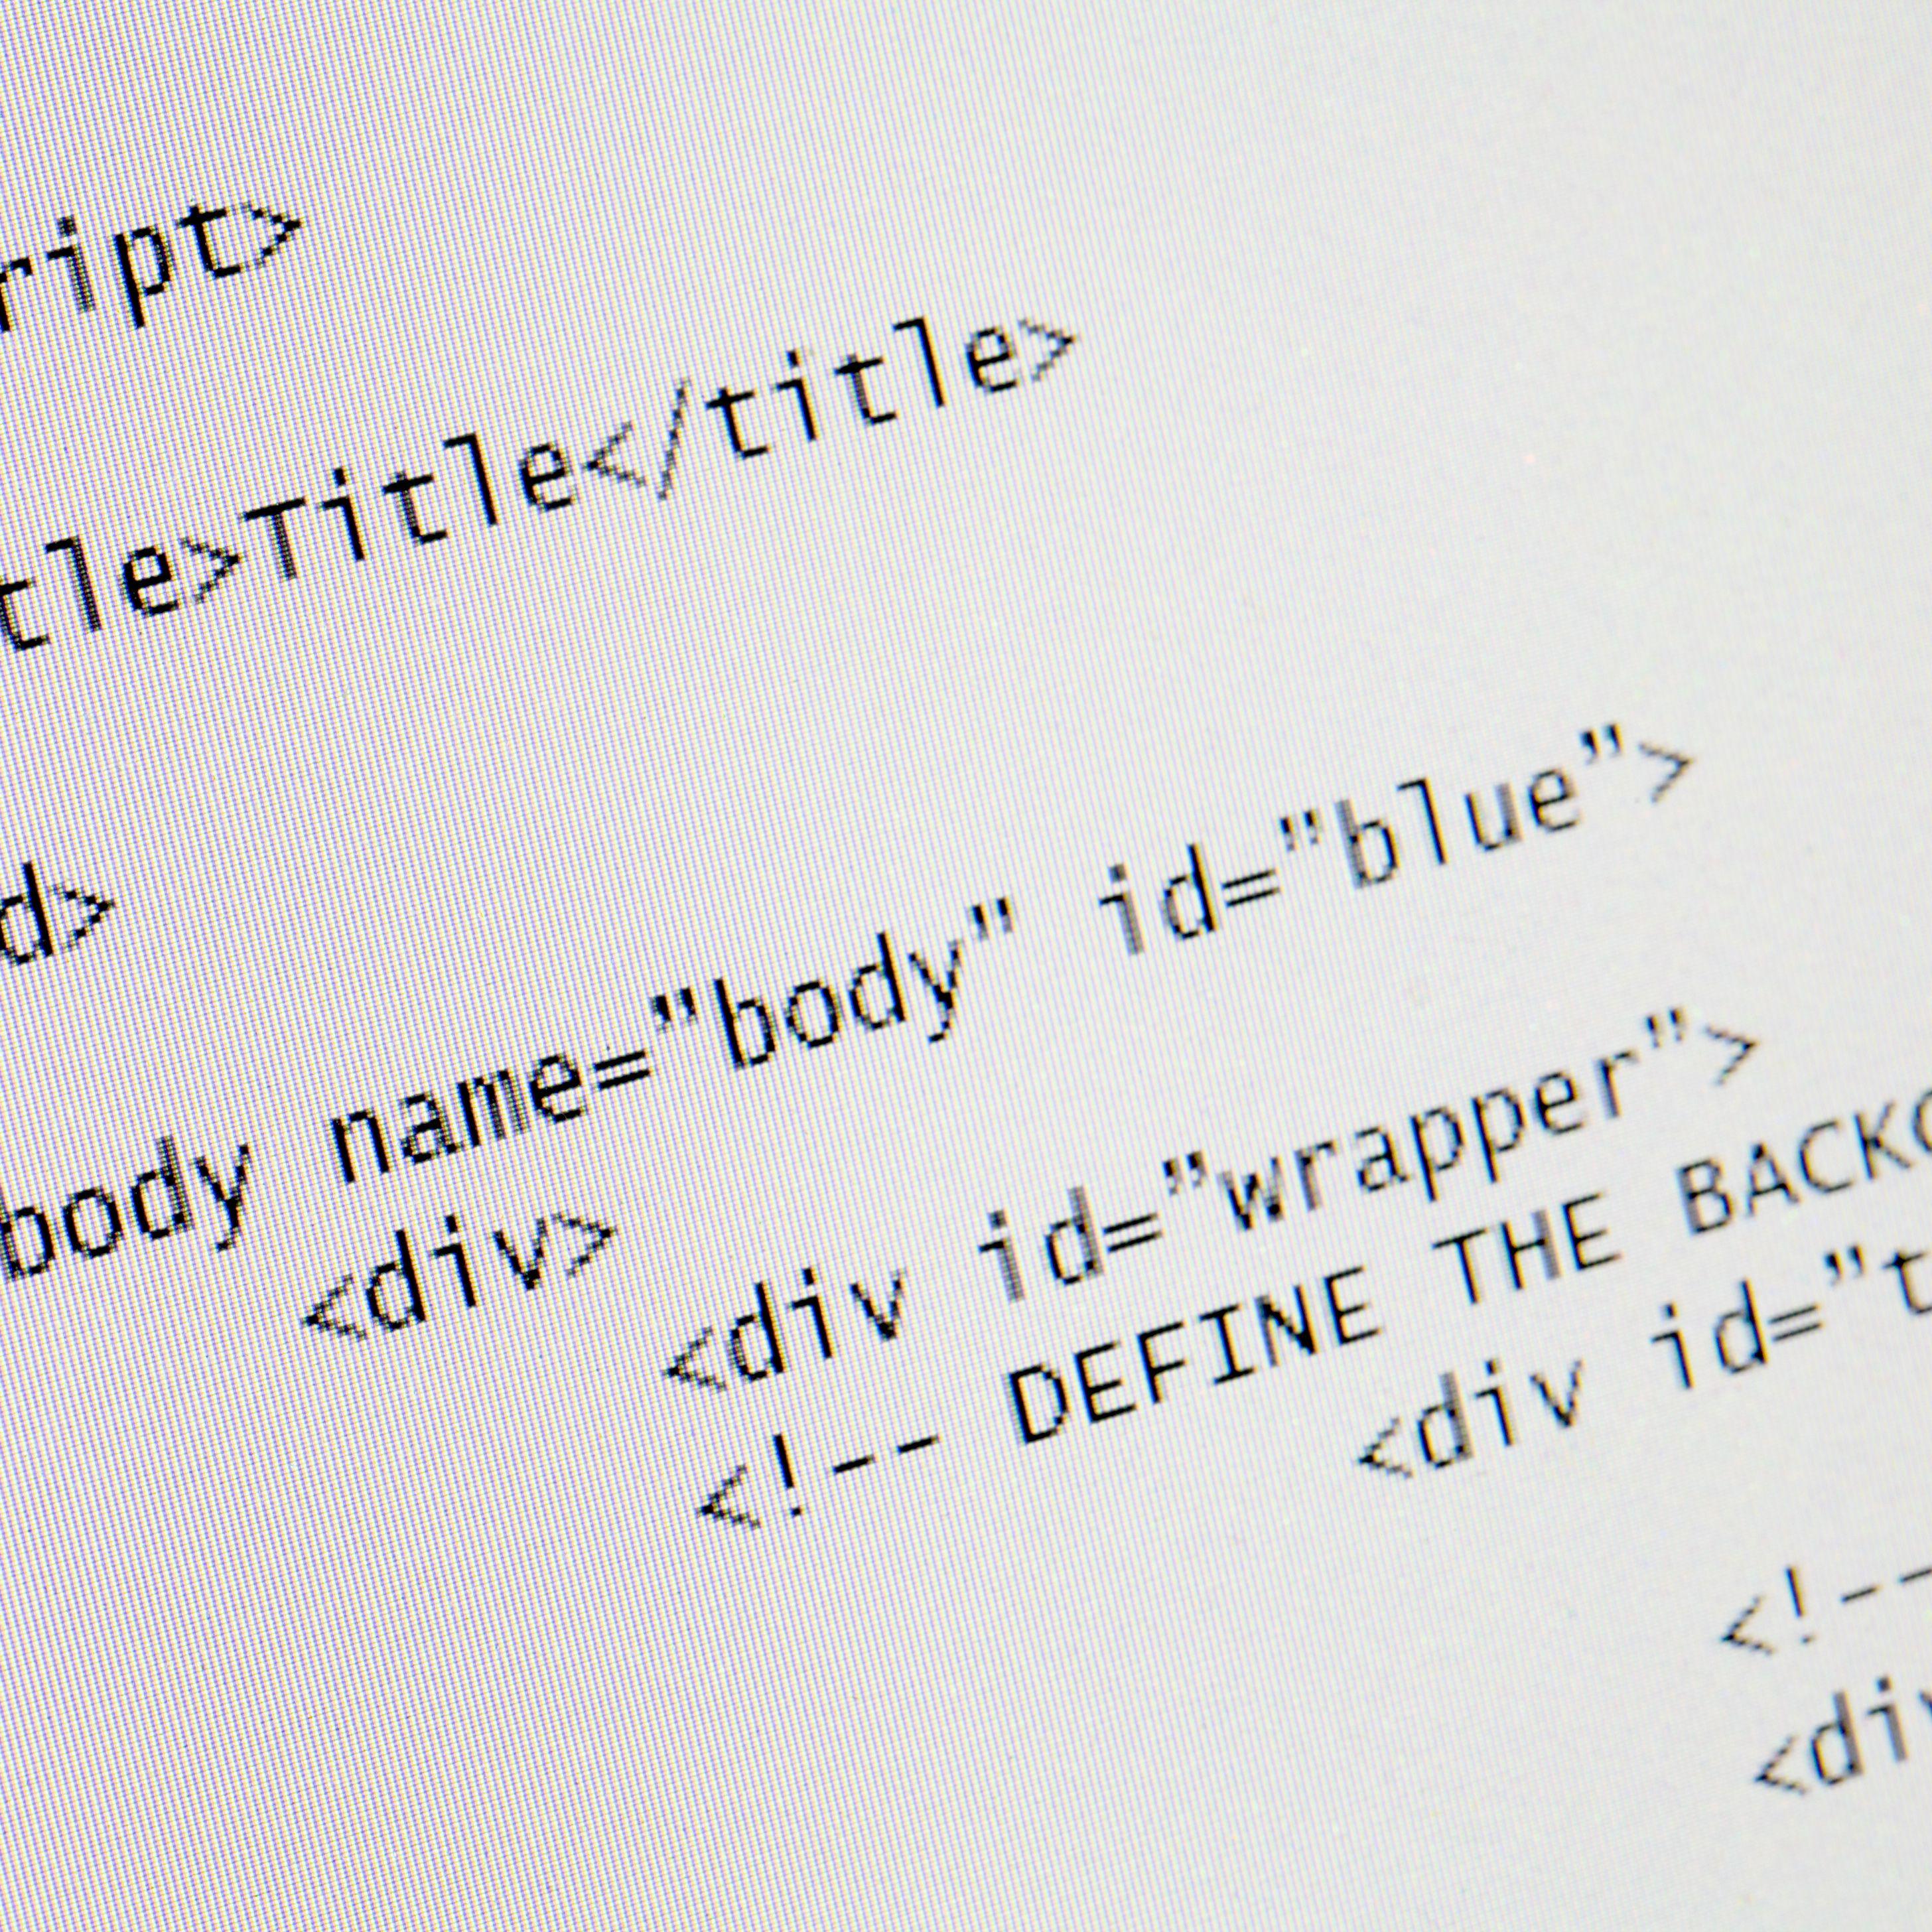 HTML Singleton Tags With No Closing Tag